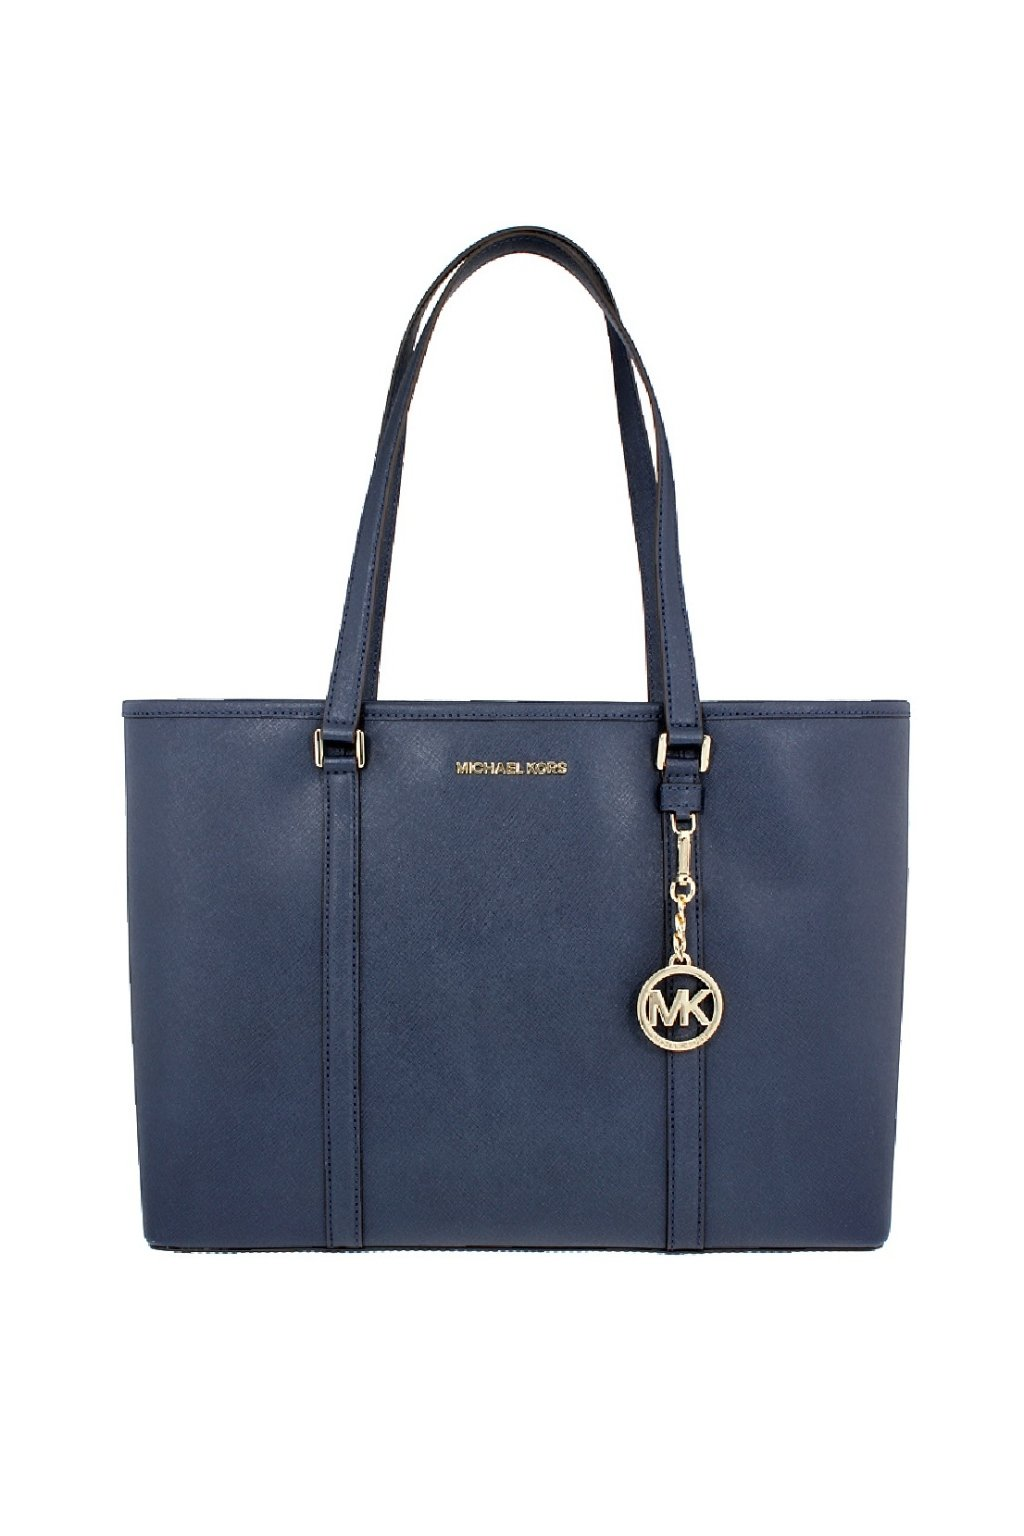 Kabelka michael kors shopperka sady tmave modra zlate kovani velka mk velka tote kabelka luxusni kabelky luxurybags parizska znackova moda kors mk hermes gucci marmont blu navy monogram (2)